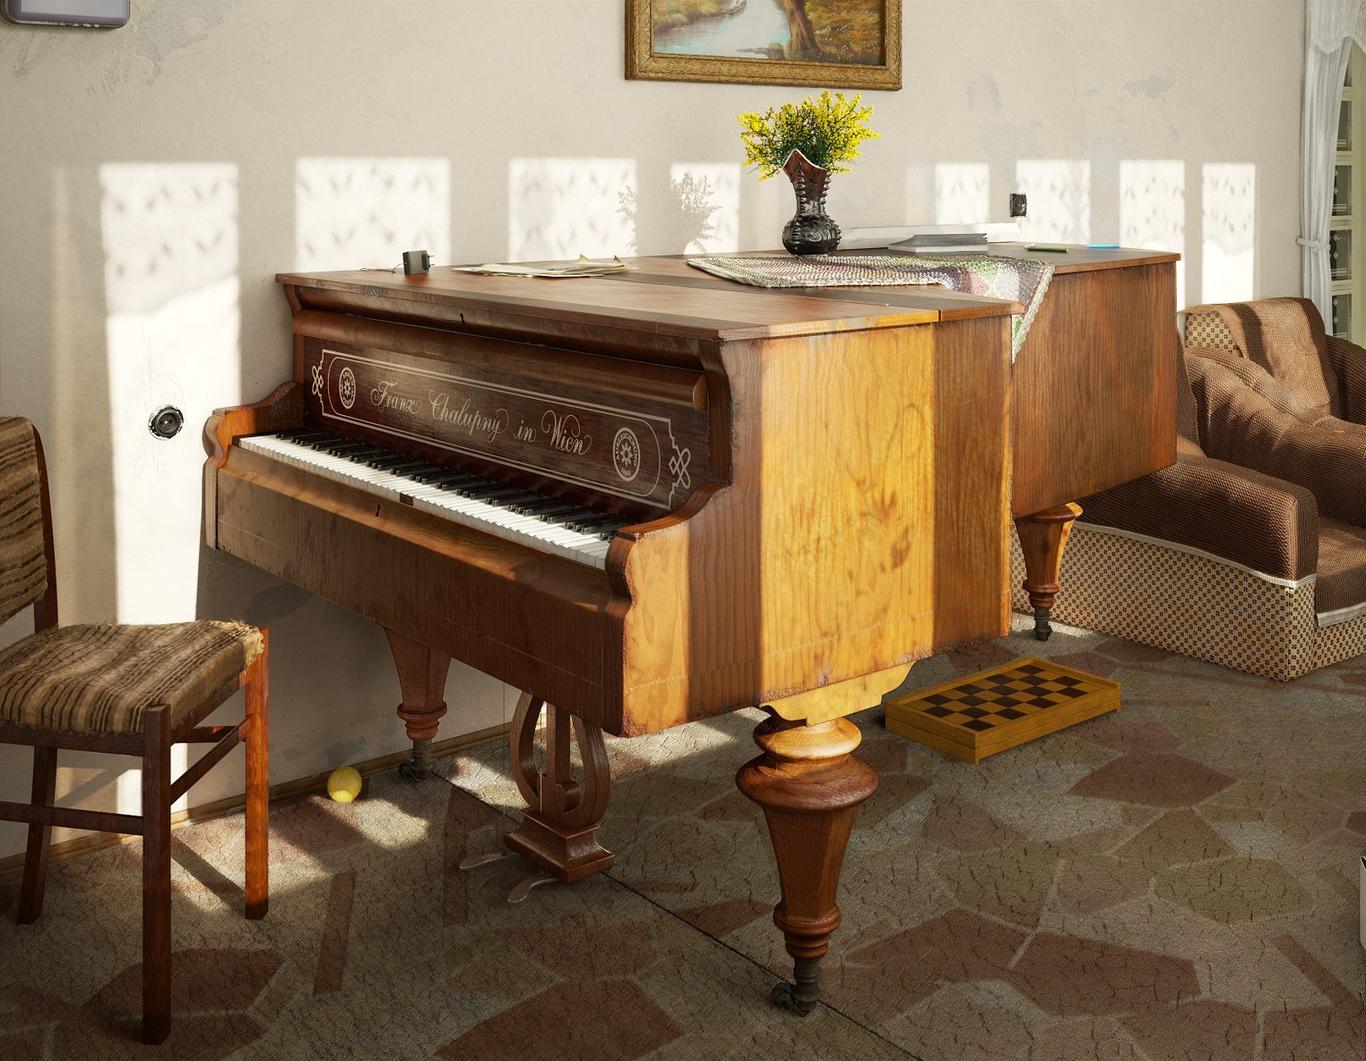 Robodesign the piano room 1 563922e9 qzdr